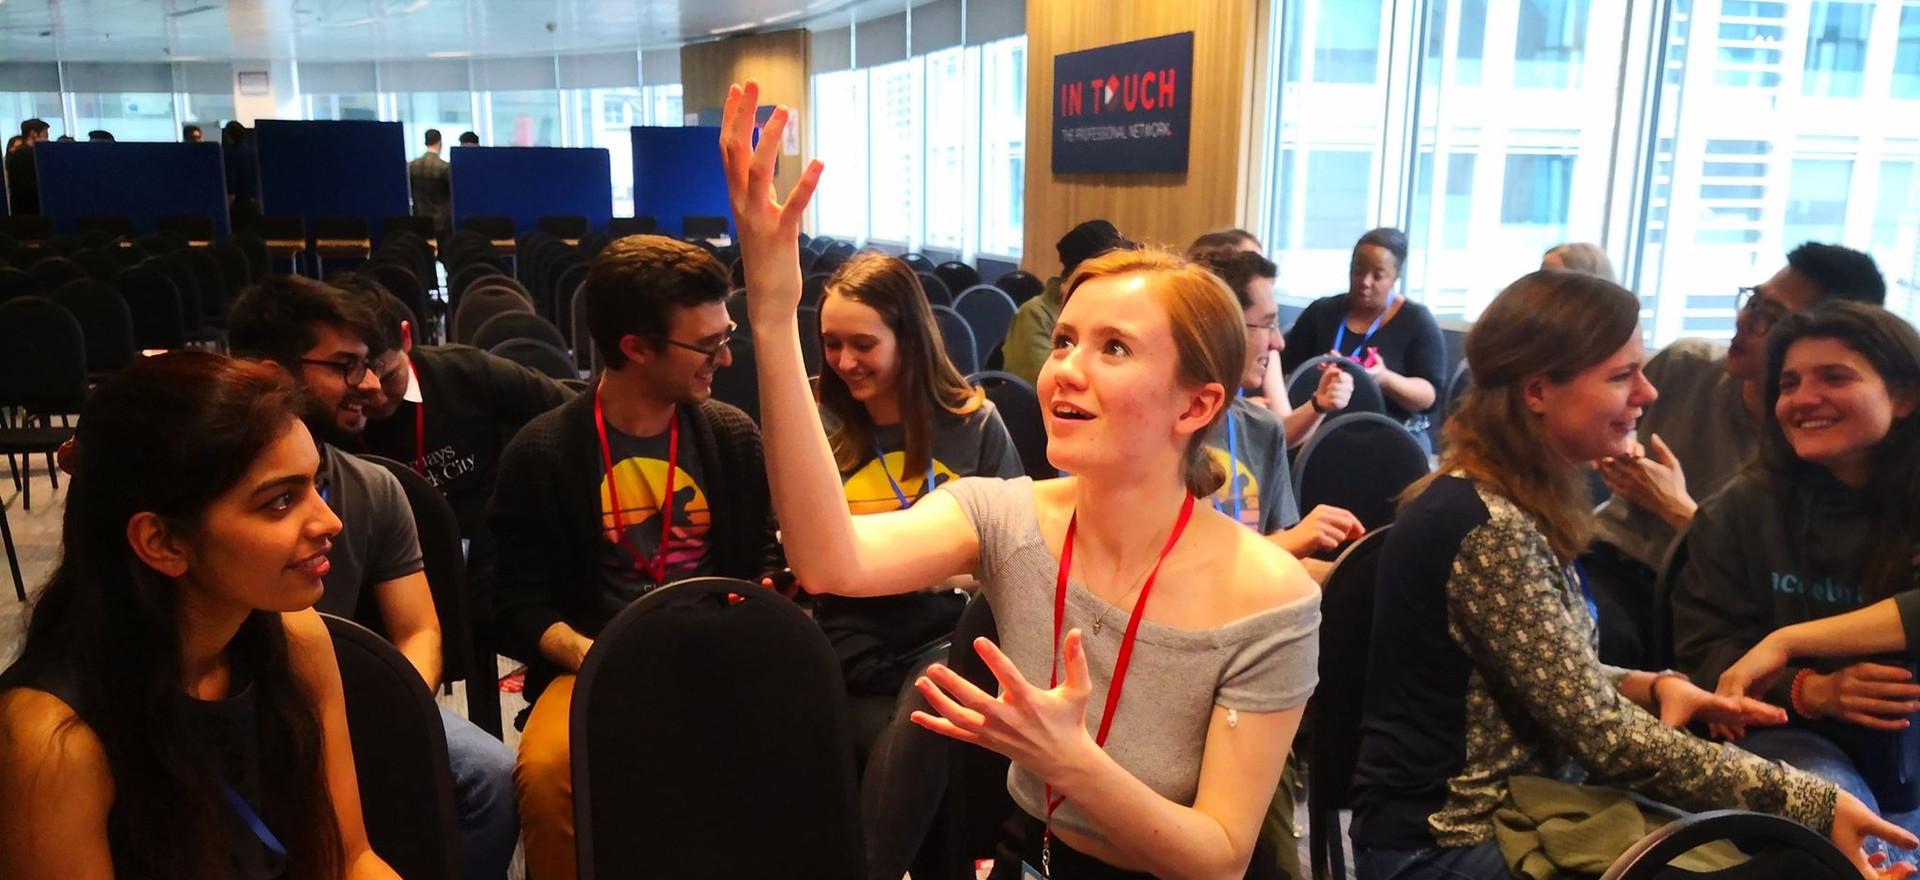 Body Language Workshop in Manchester